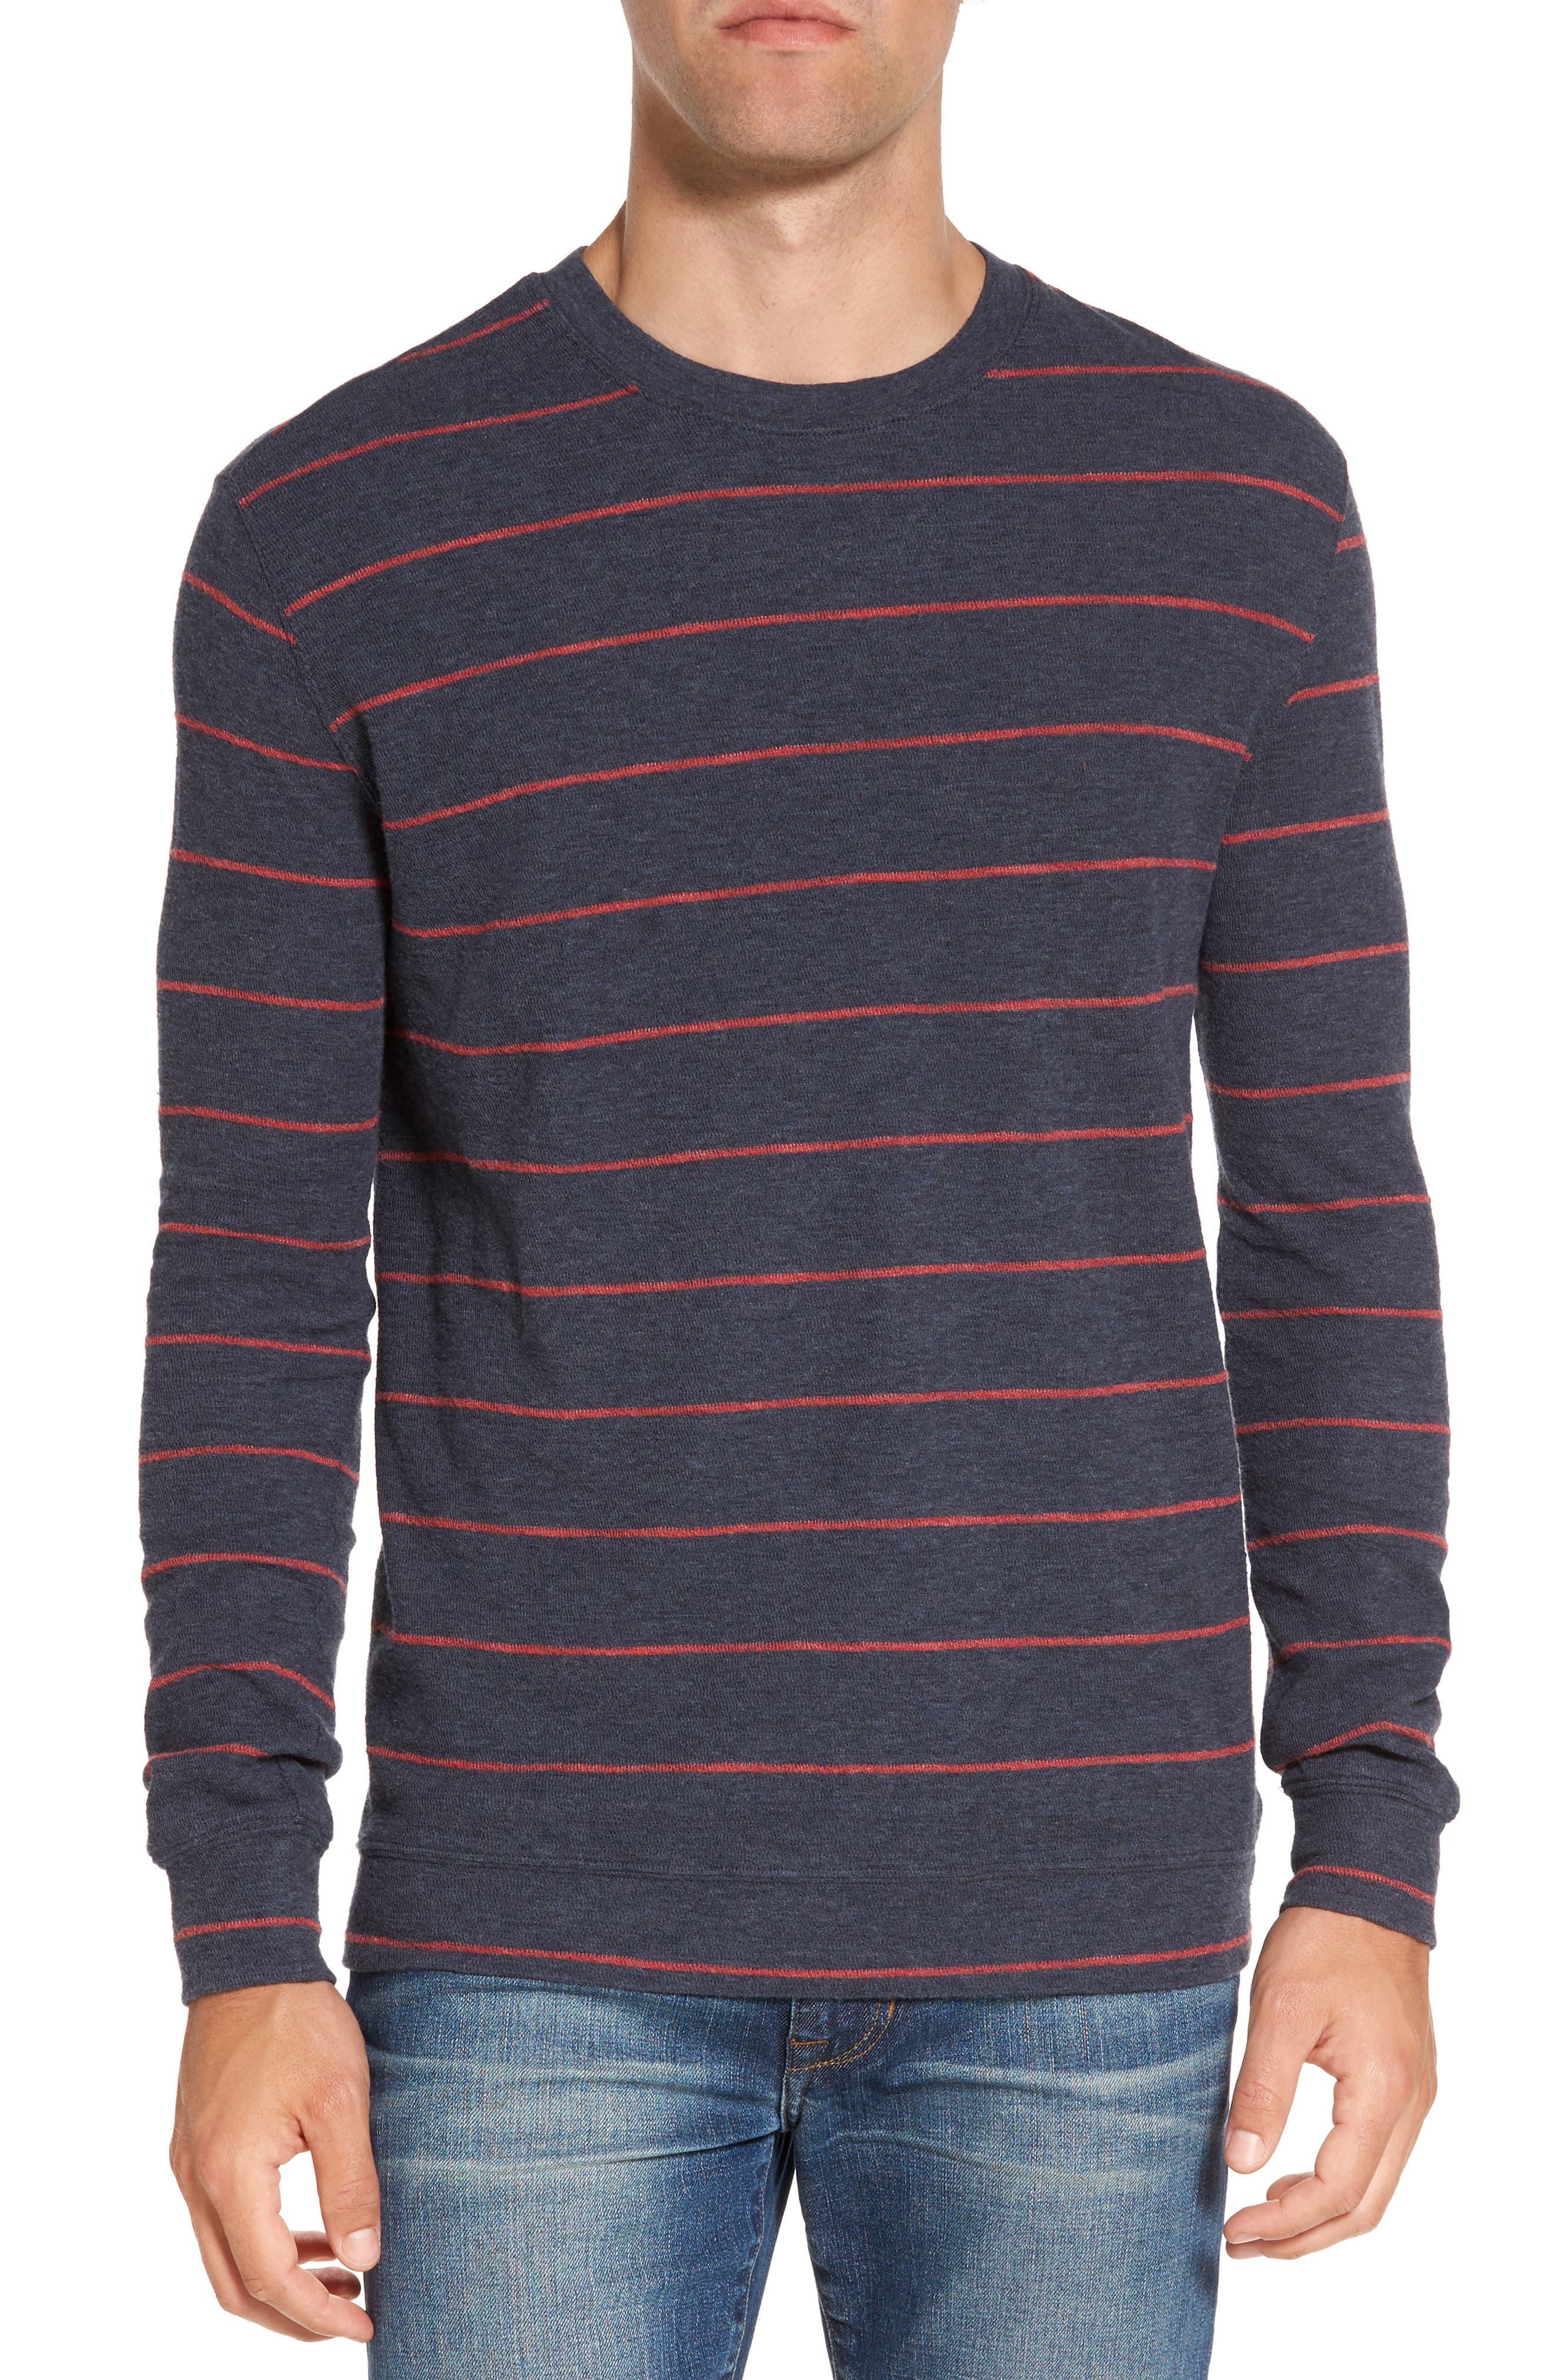 Grayers Baird Stripe Crewneck Sweatshirt